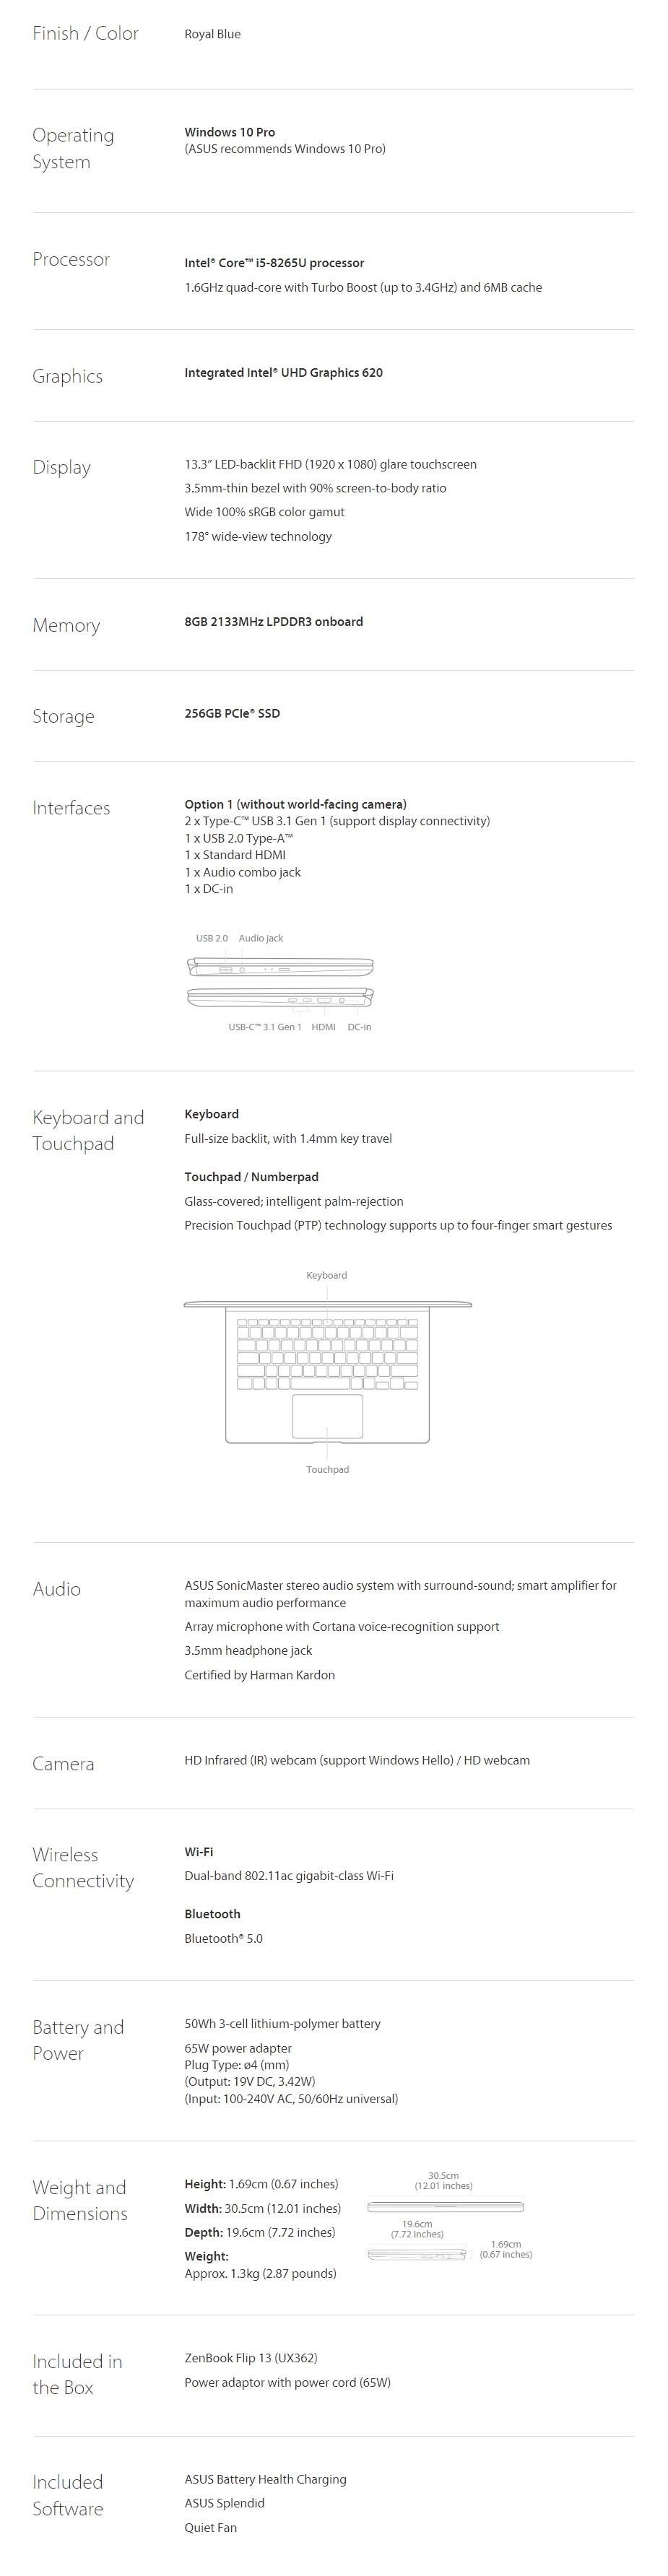 "ASUS ZenBook Flip 13 UX362FA 13.3"" Notebook i5-82665U 8GB 256GB Win10 Pro - Overview 2"